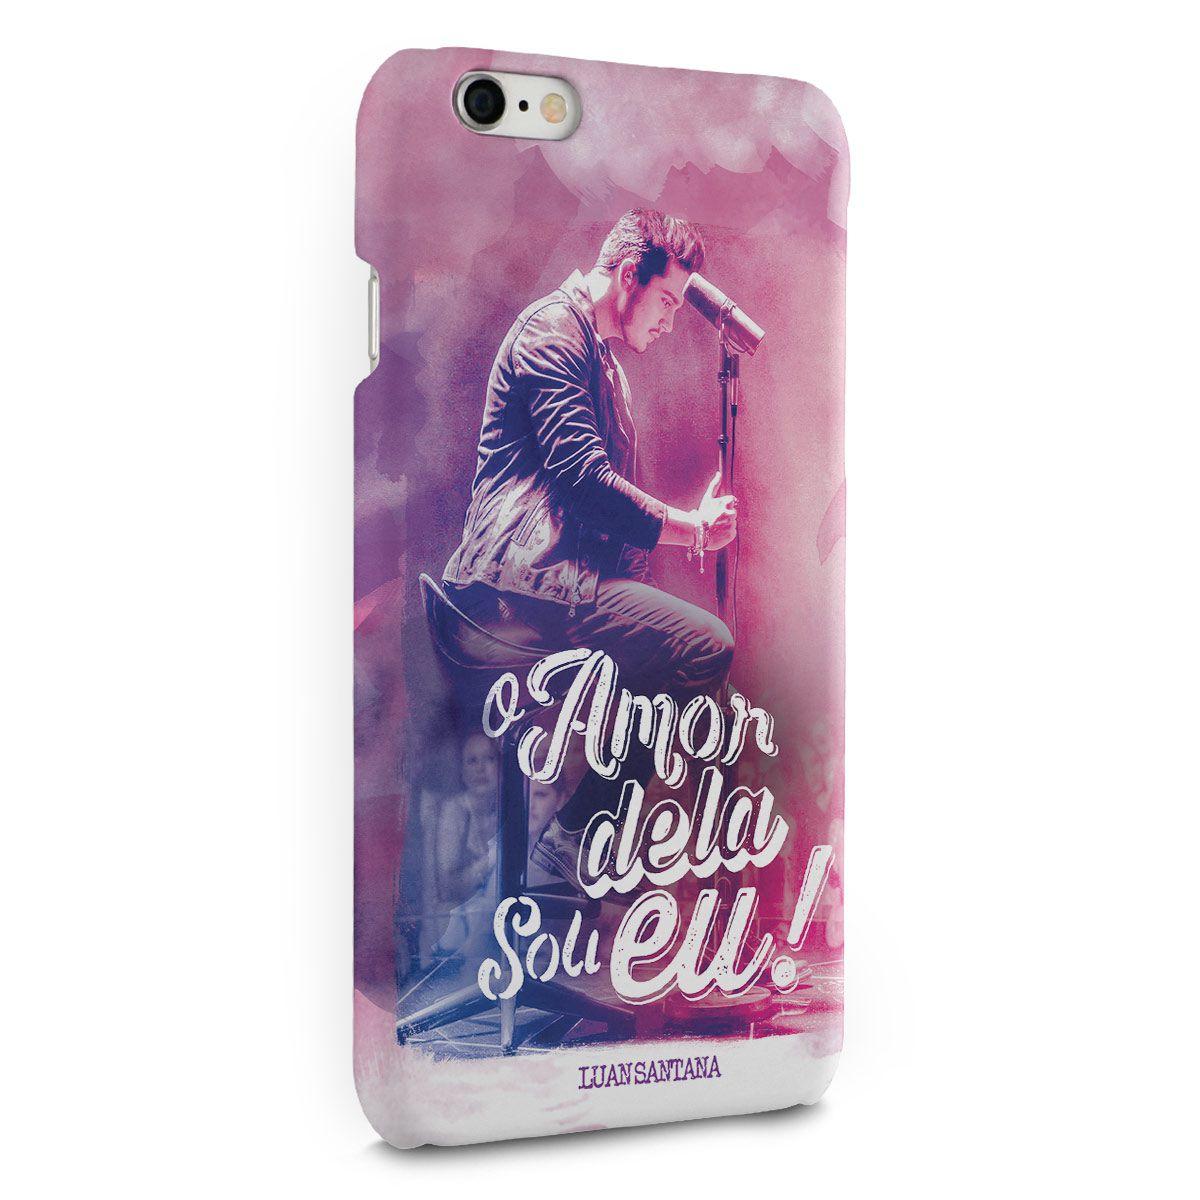 Capa para iPhone 6/6S Plus Luan Santana O Amor Dela Sou Eu